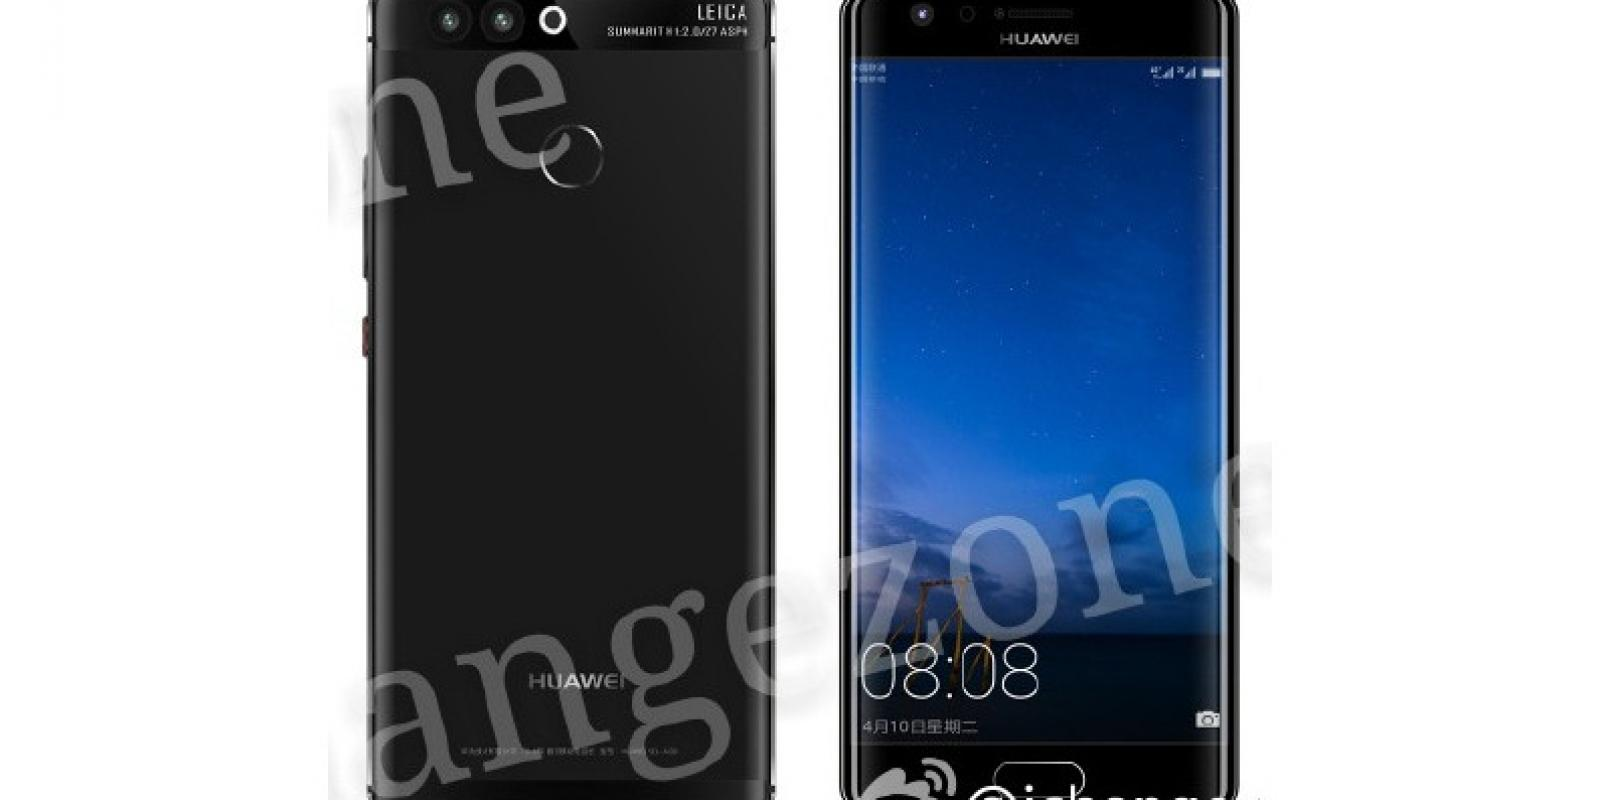 16d Huawei P10 afbeelding